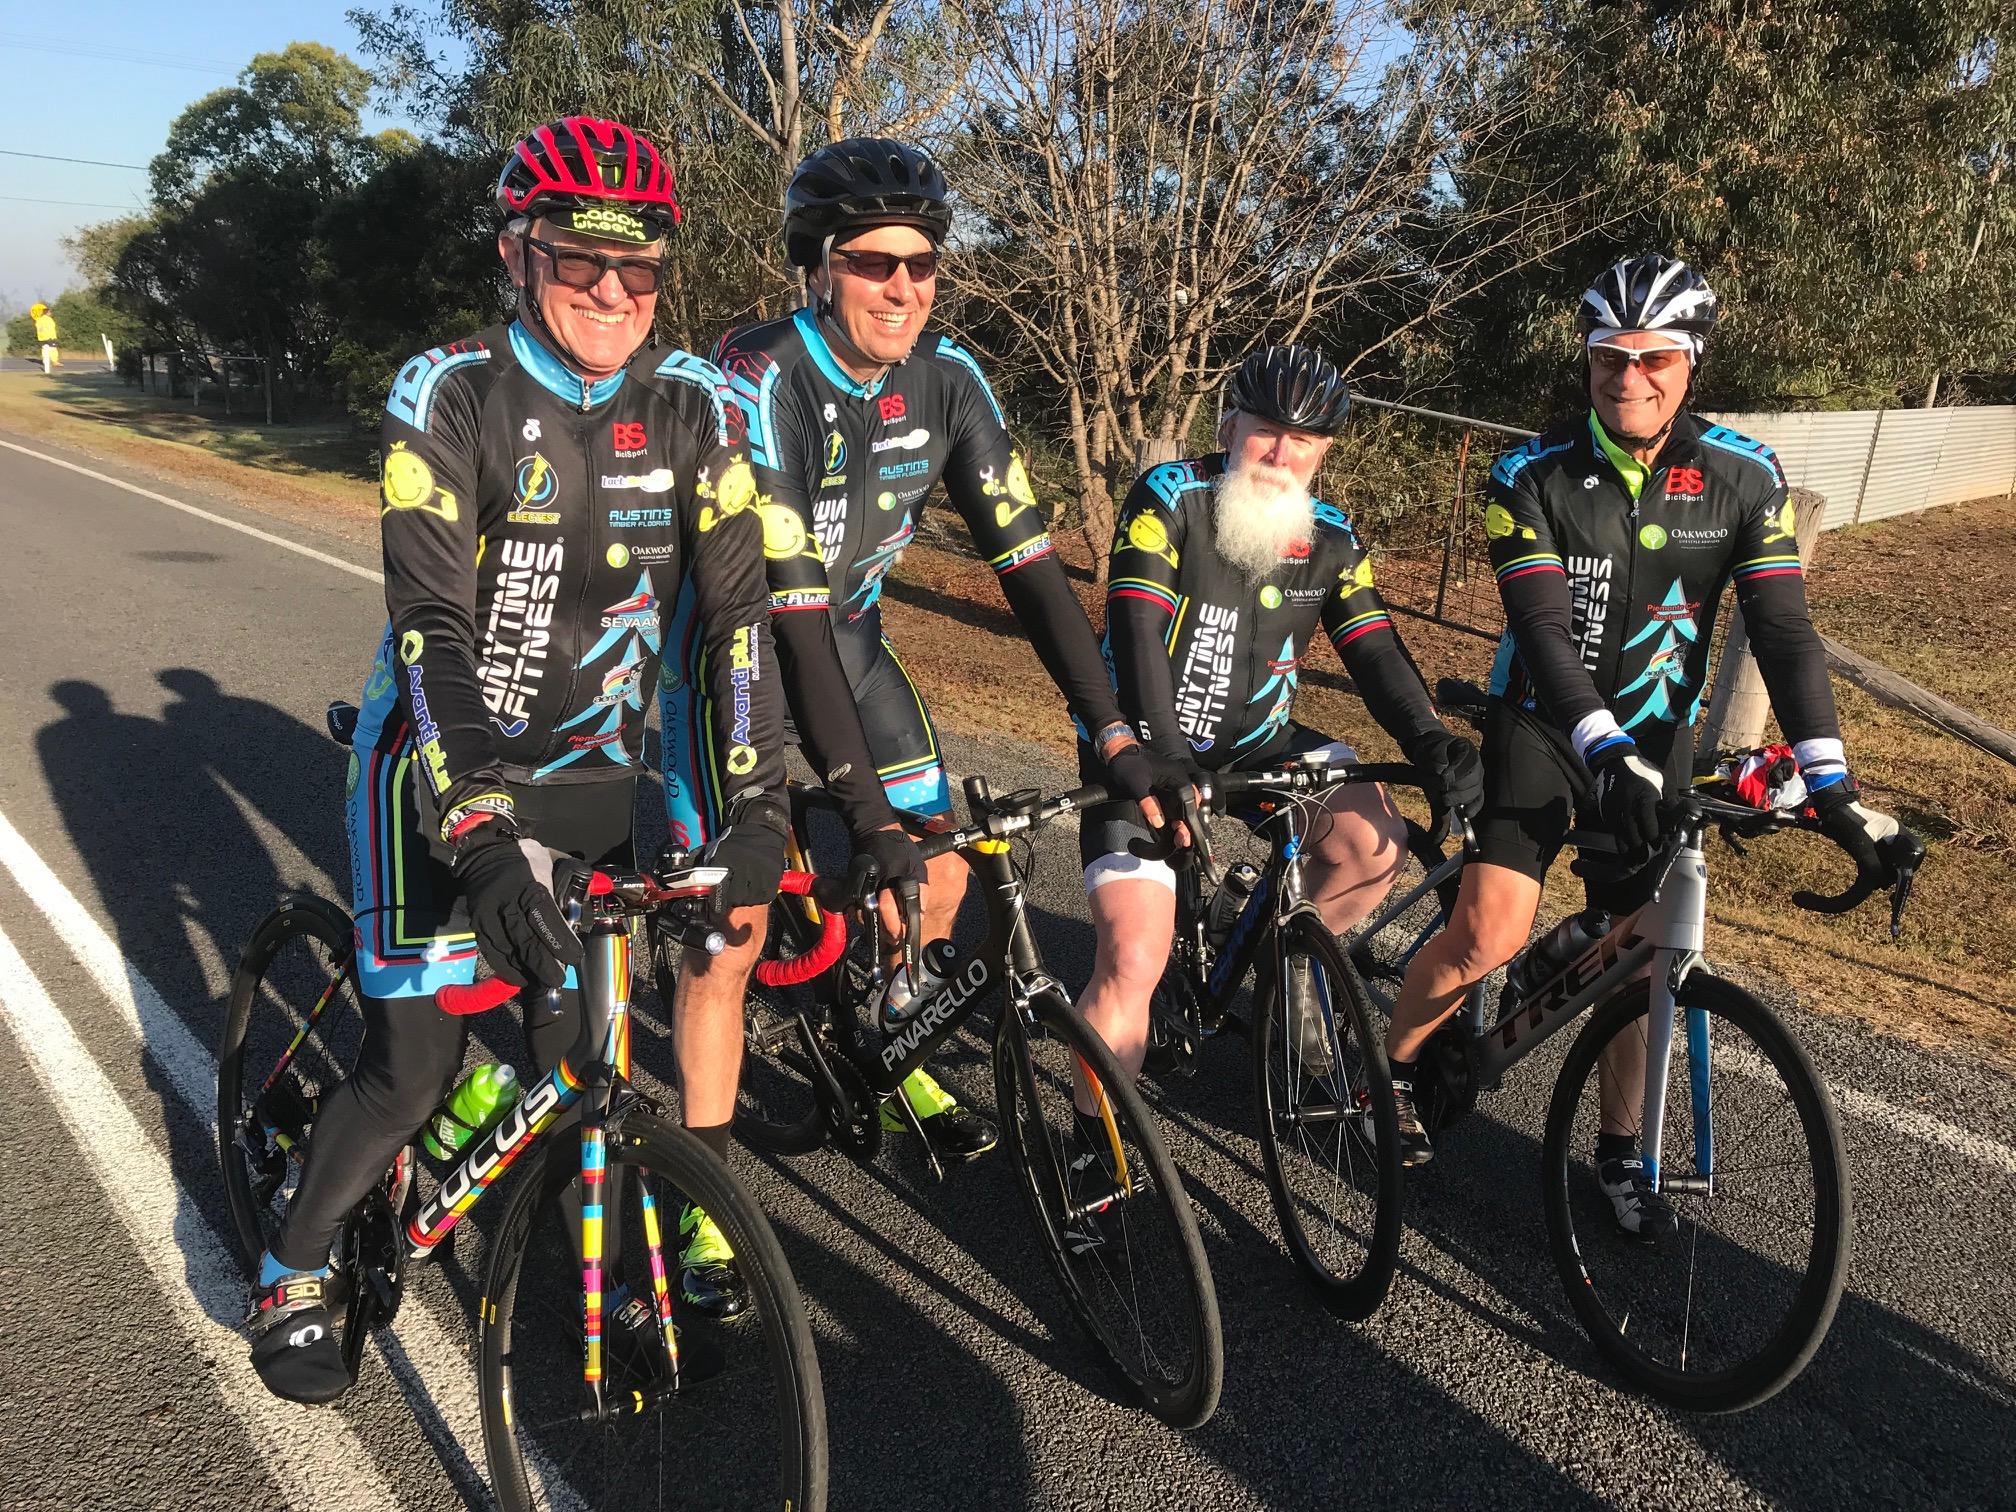 NSW Team Time Trial @ 3 August …. Peter Davis, Tony Jones, Bundy McLean & Tony Delgigante. Peter Davis got lost and was last seen riding towards Tamworth ….